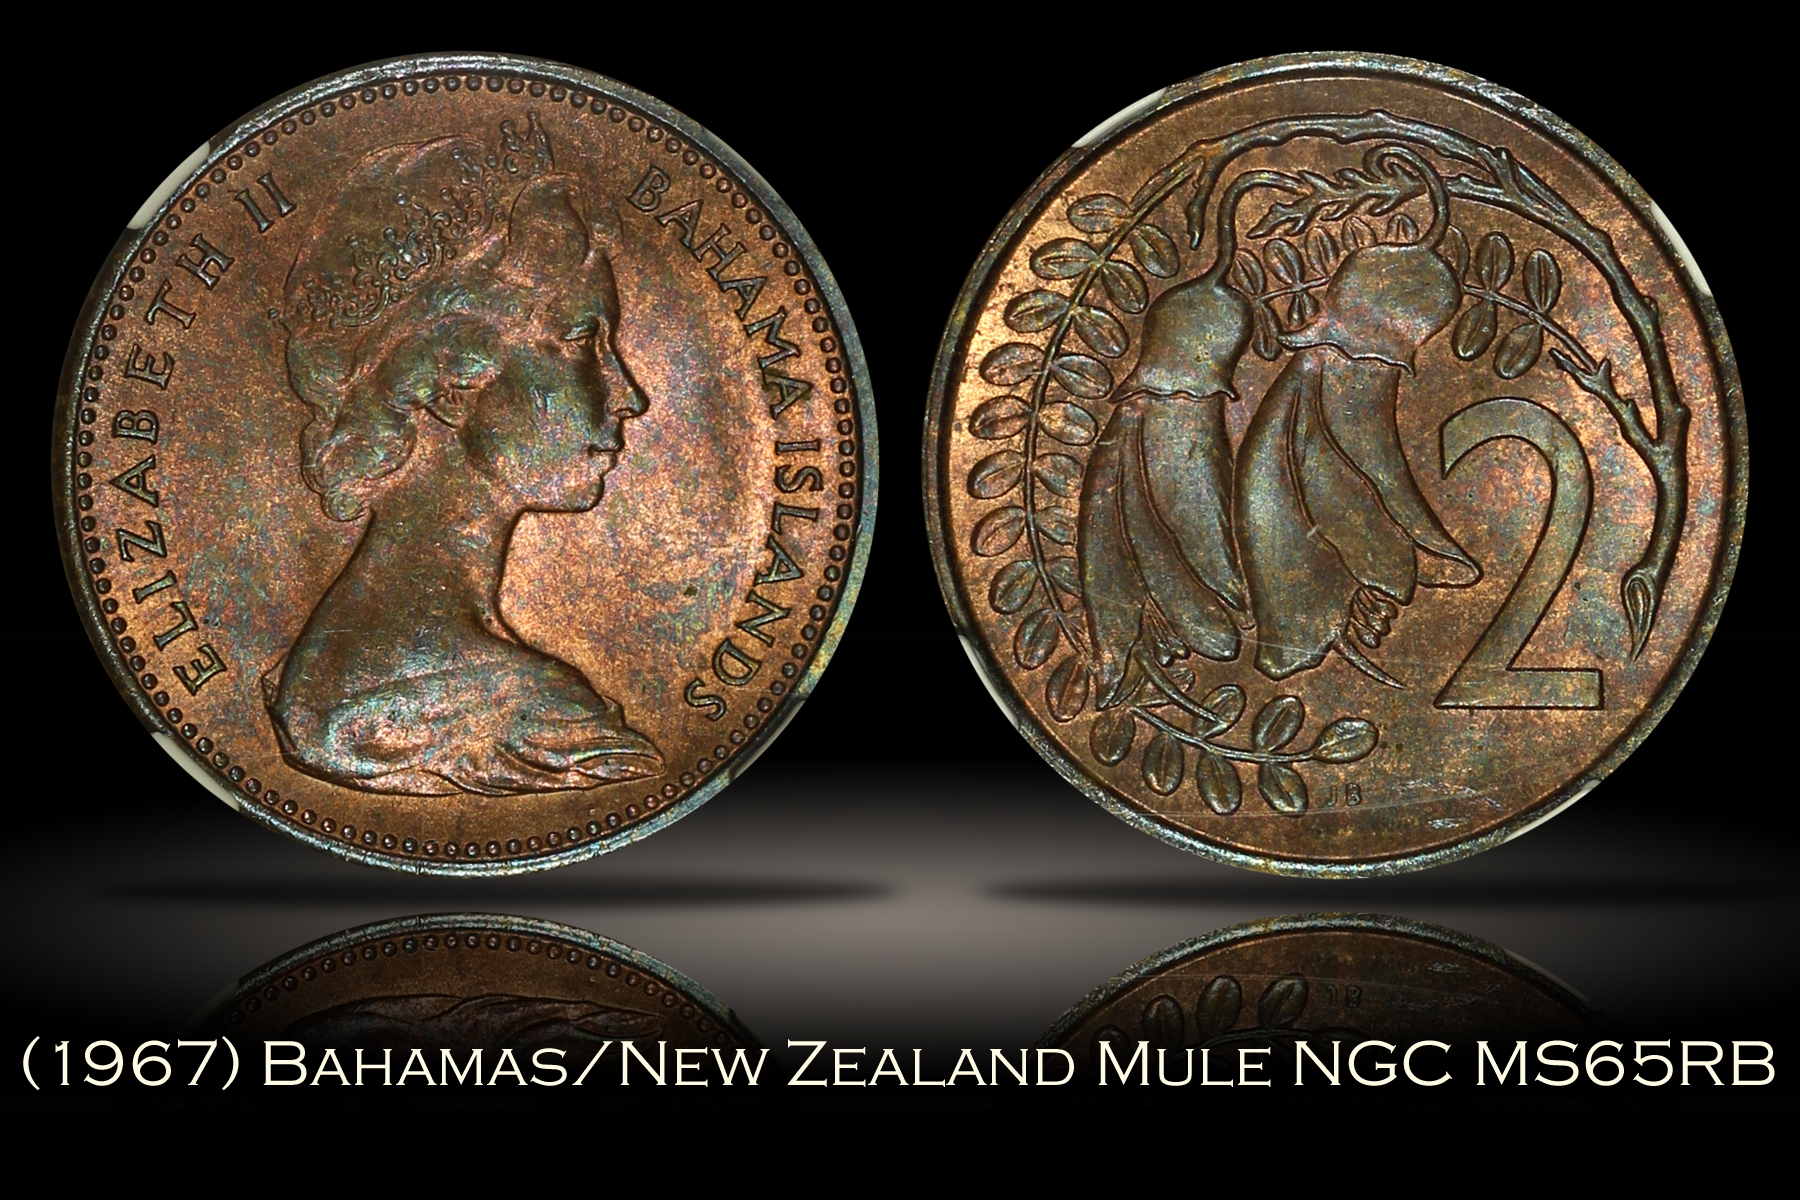 1967 Bahamas New Zealand 2 Cent Mule Ngc Ms65rb